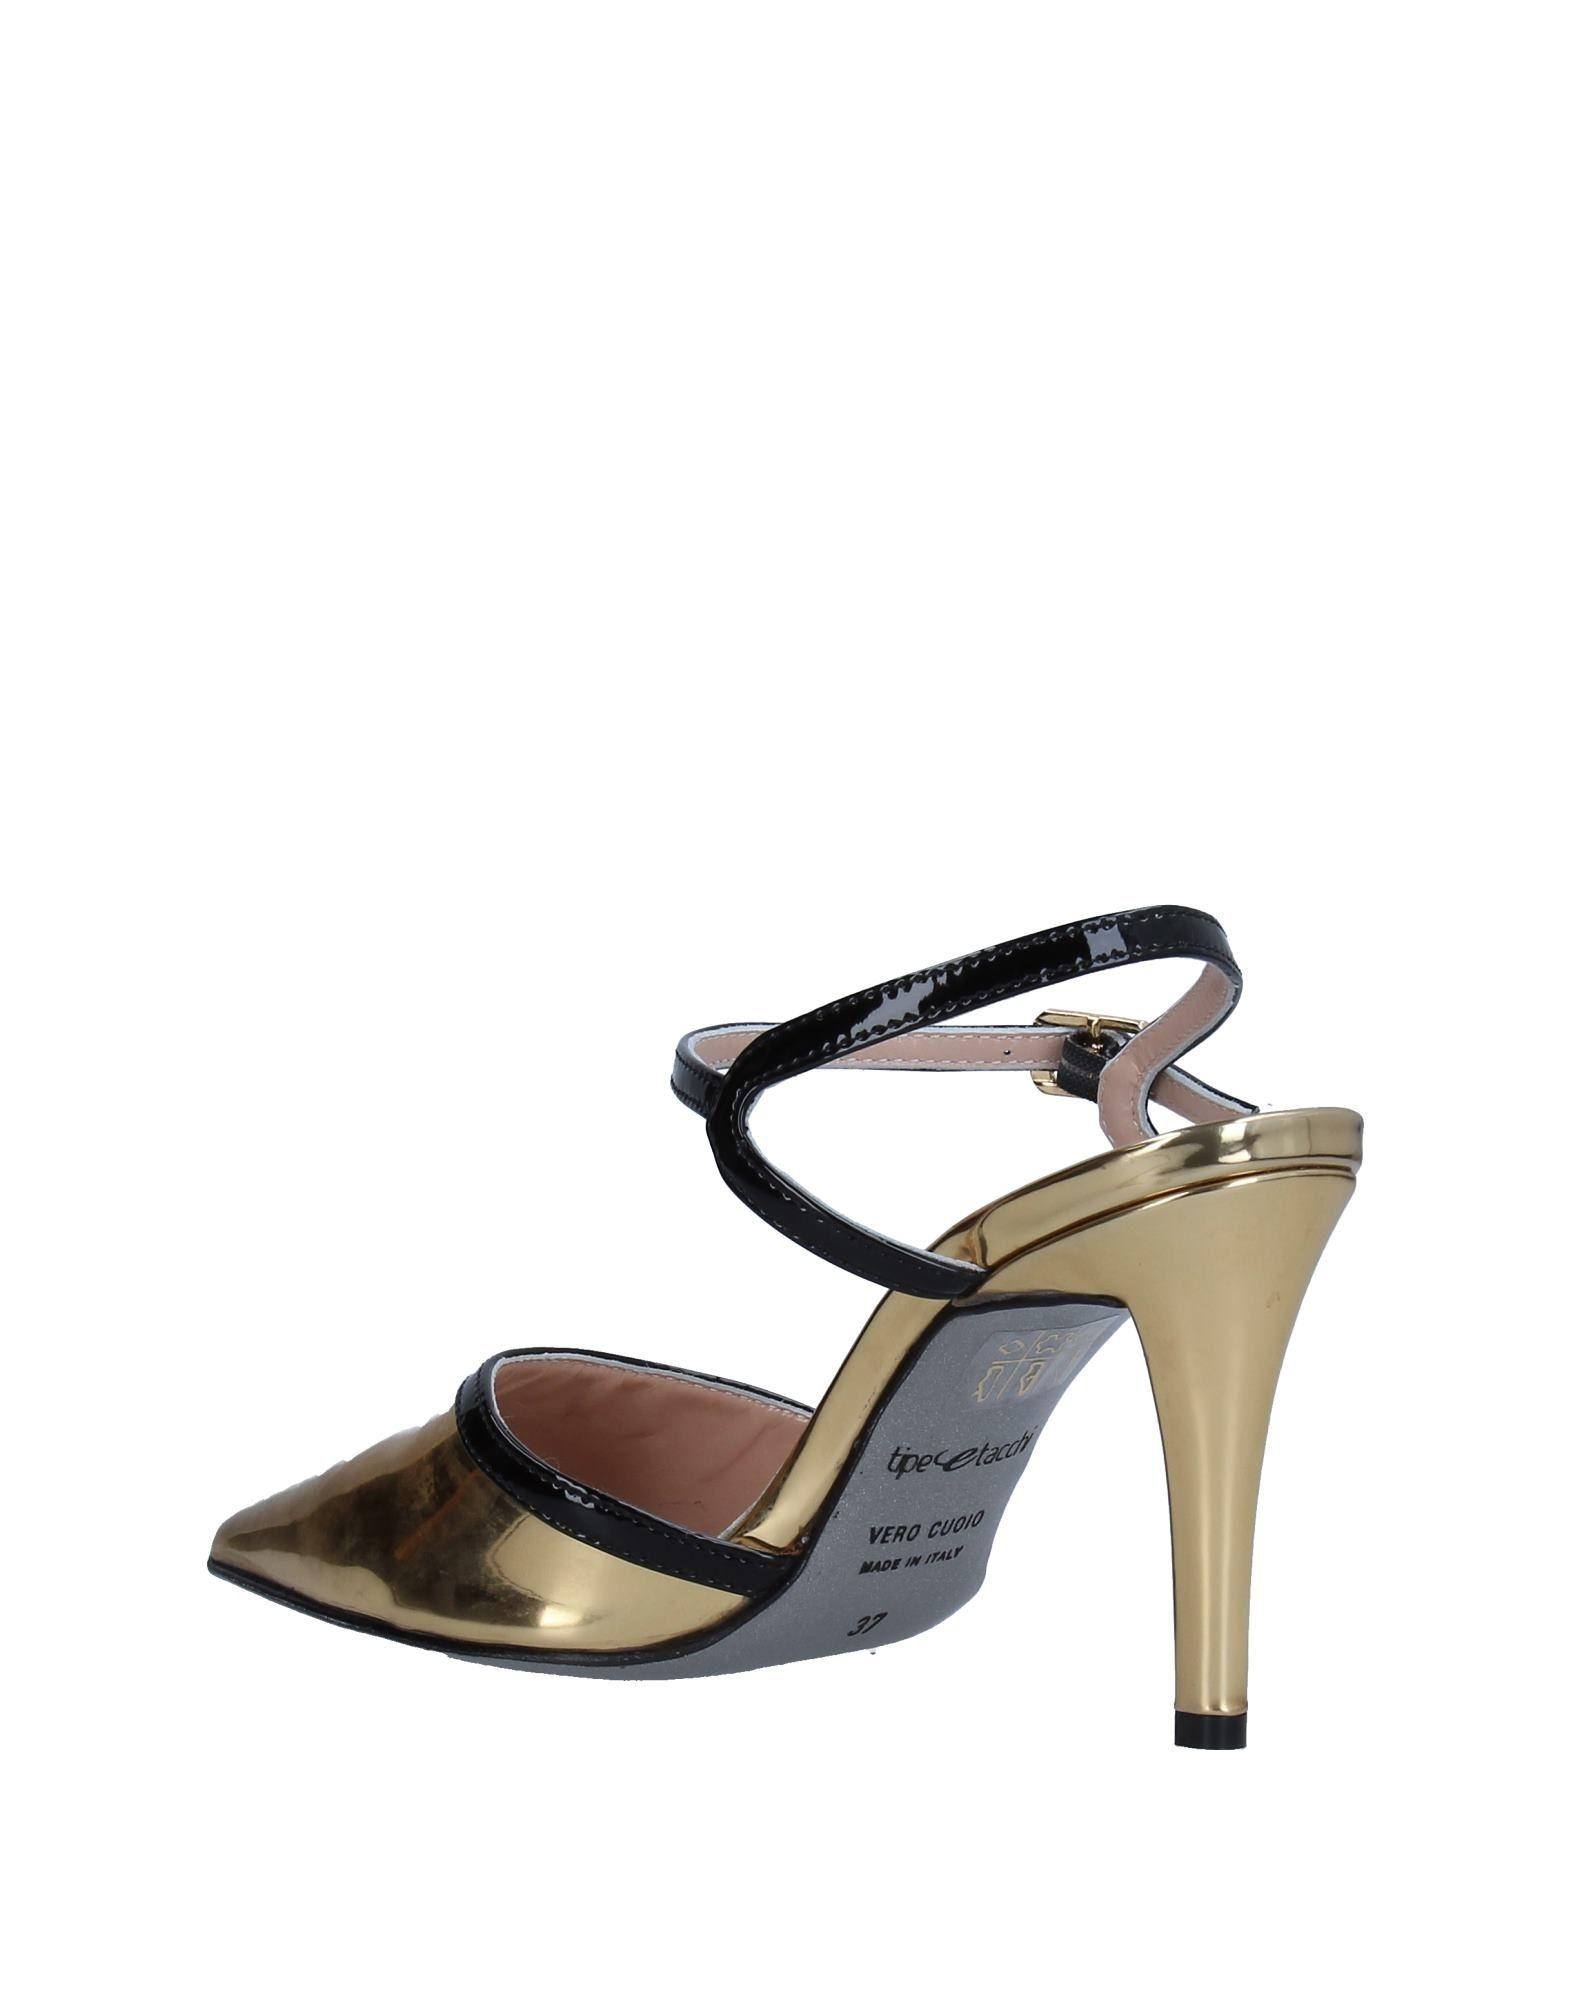 Tipe 11332611IT E Tacchi Pumps Damen  11332611IT Tipe Gute Qualität beliebte Schuhe 5c7094